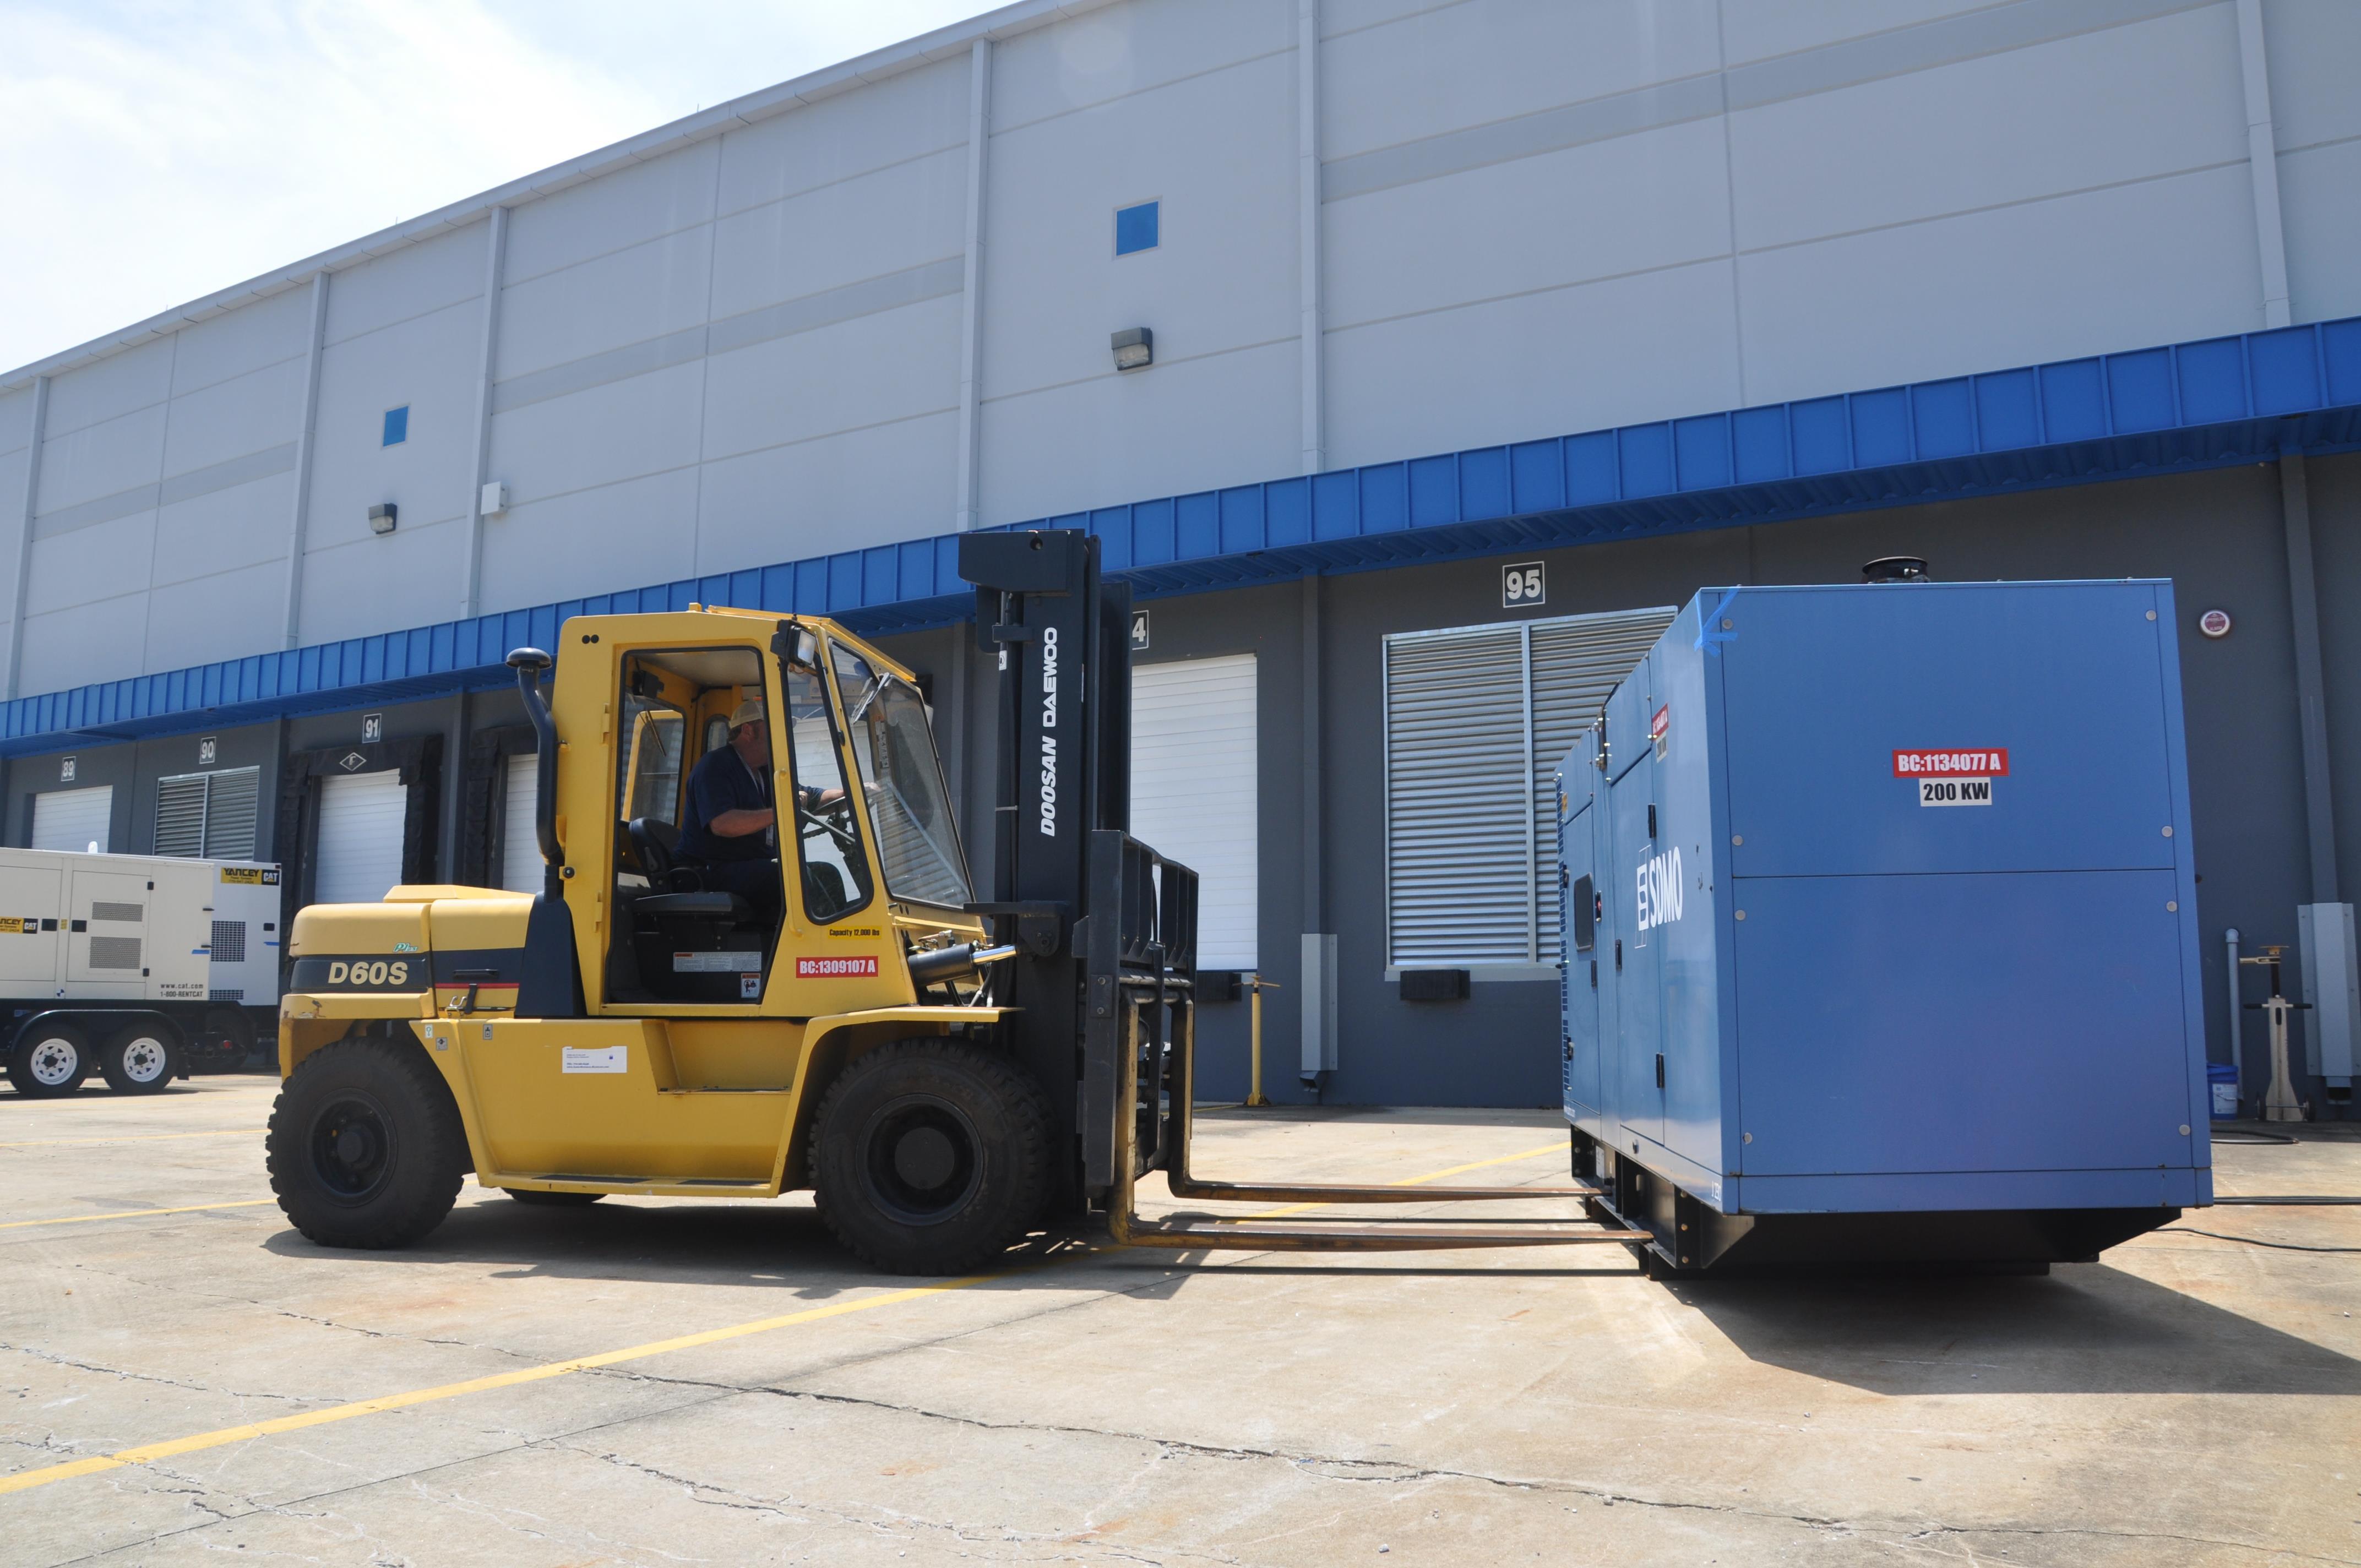 Temporary emergency power team rea s for hurricane season